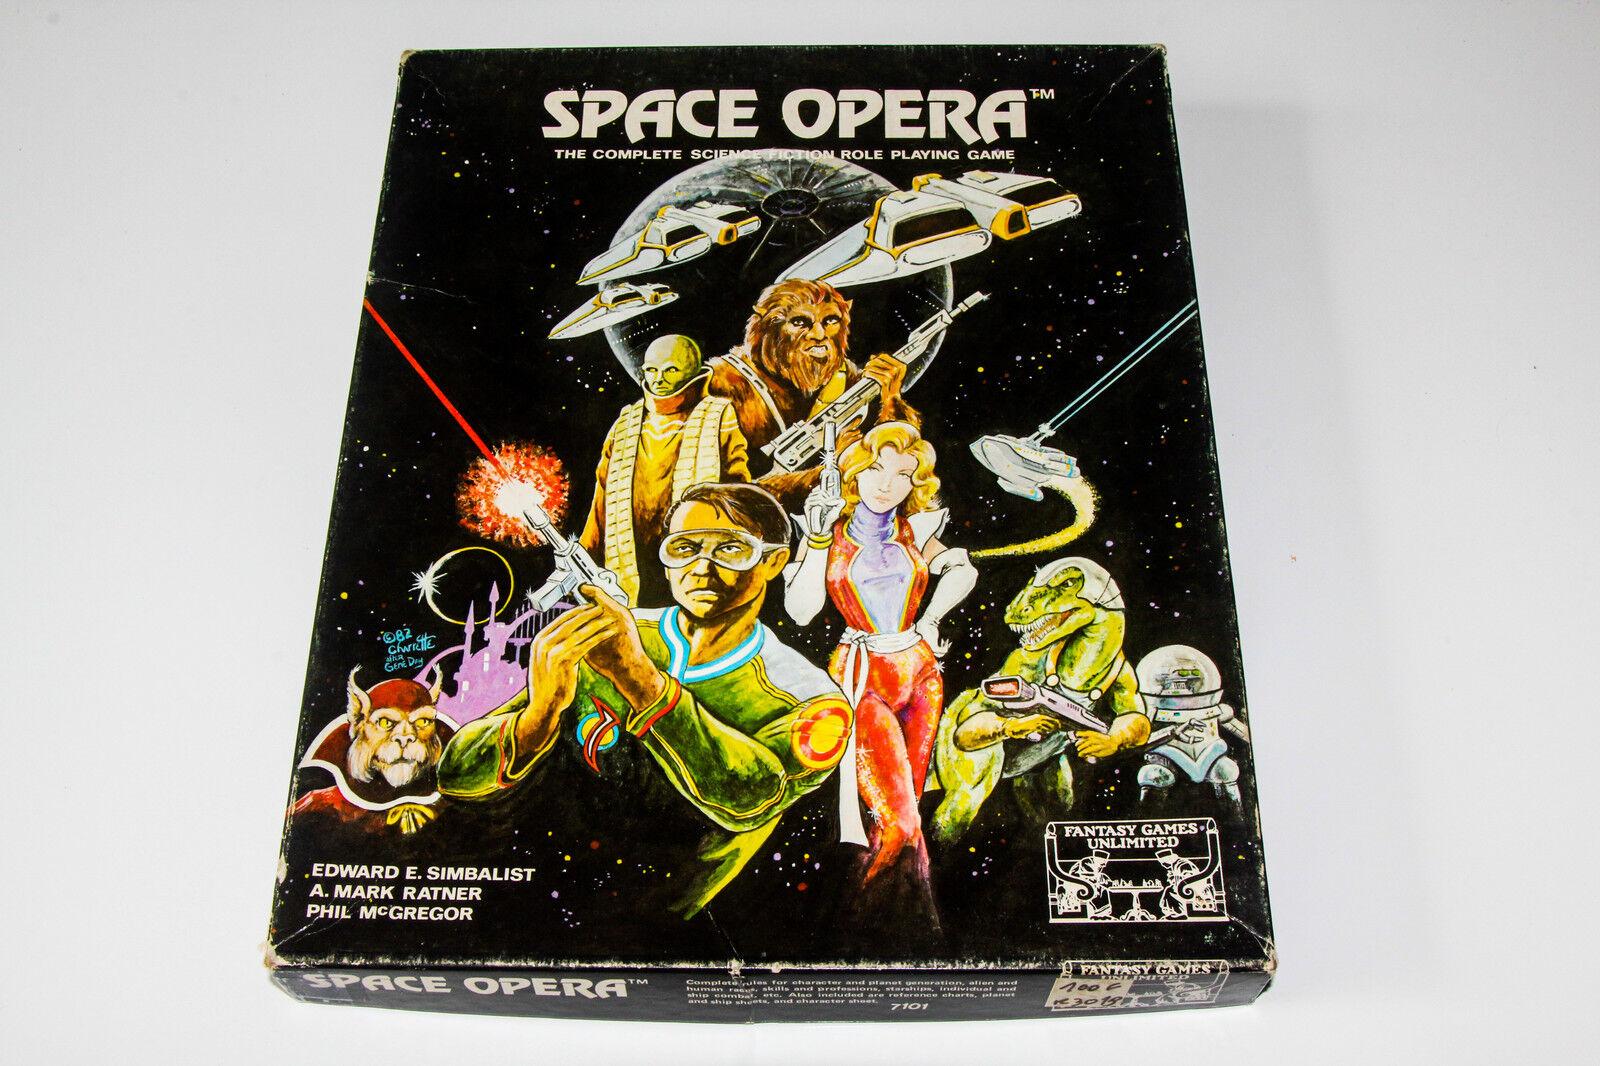 SPACE OPERA - COFFRET - BOXED